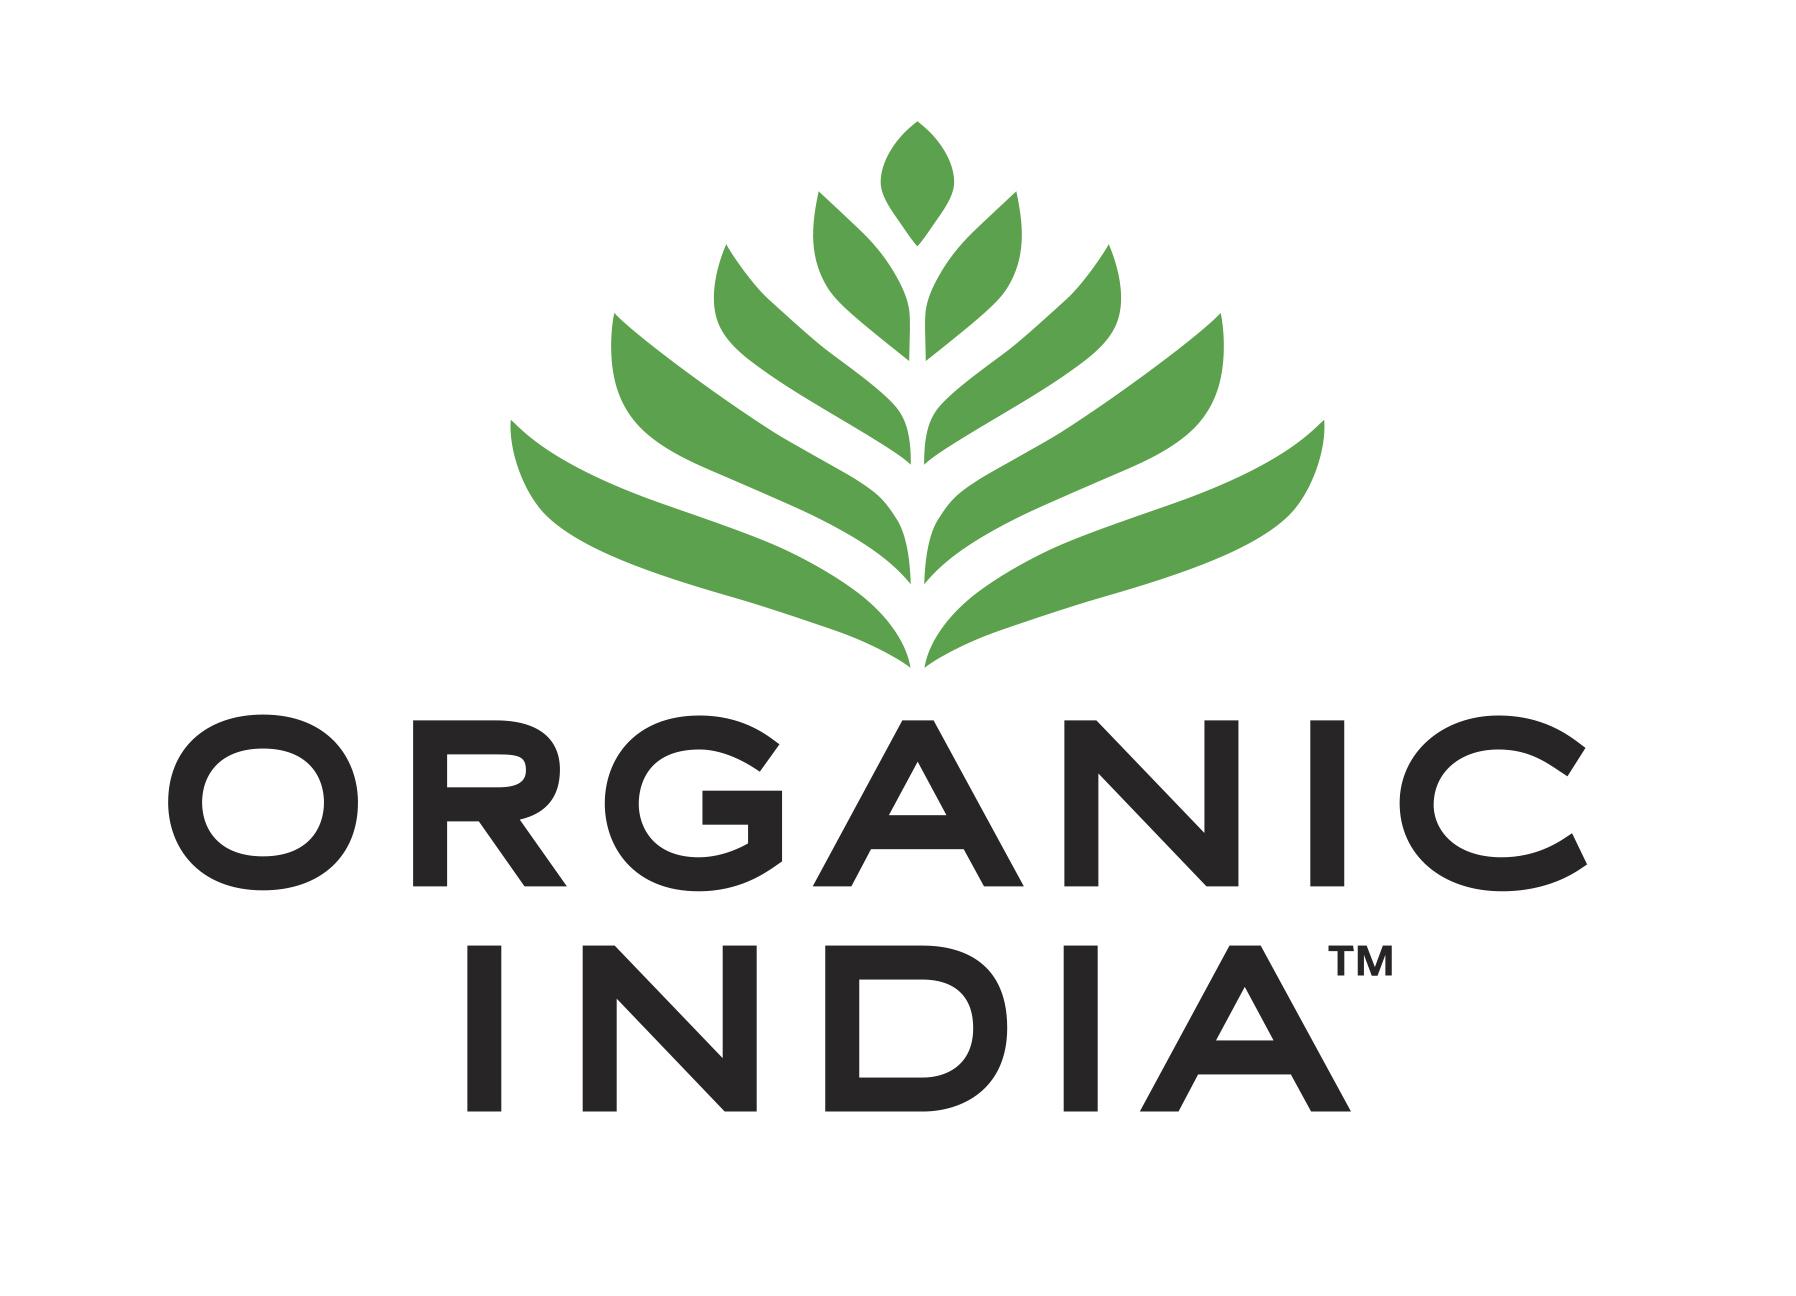 Organic_India_OI_logo_colorn.jpg